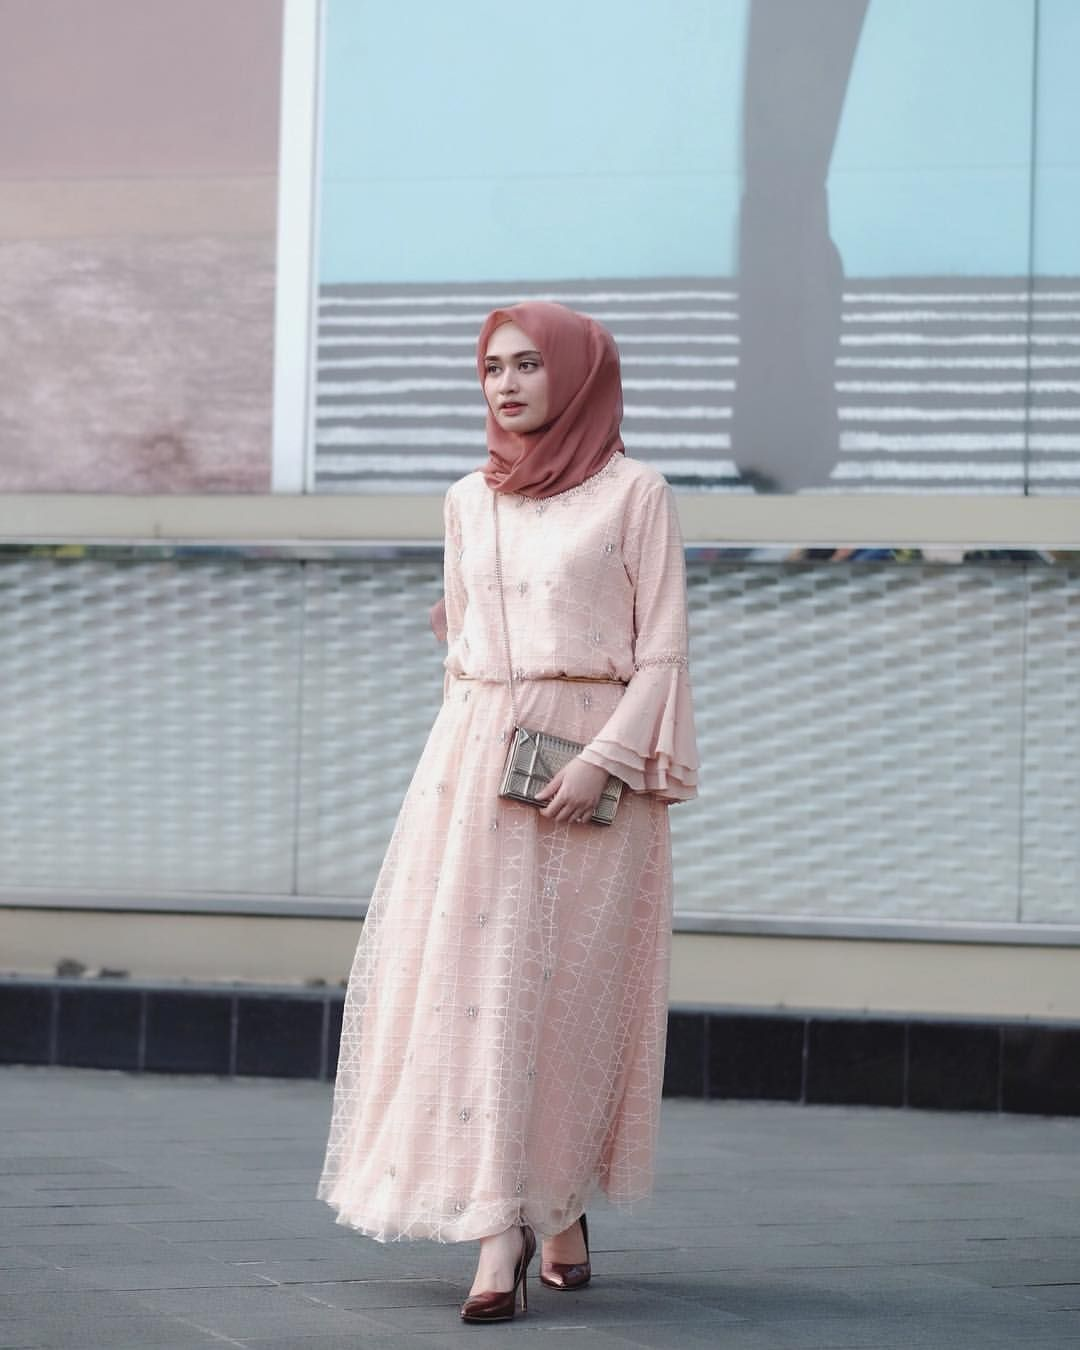 Pin by muharna on muslim fashion | Pinterest | Hijab outfit, Kebaya ...